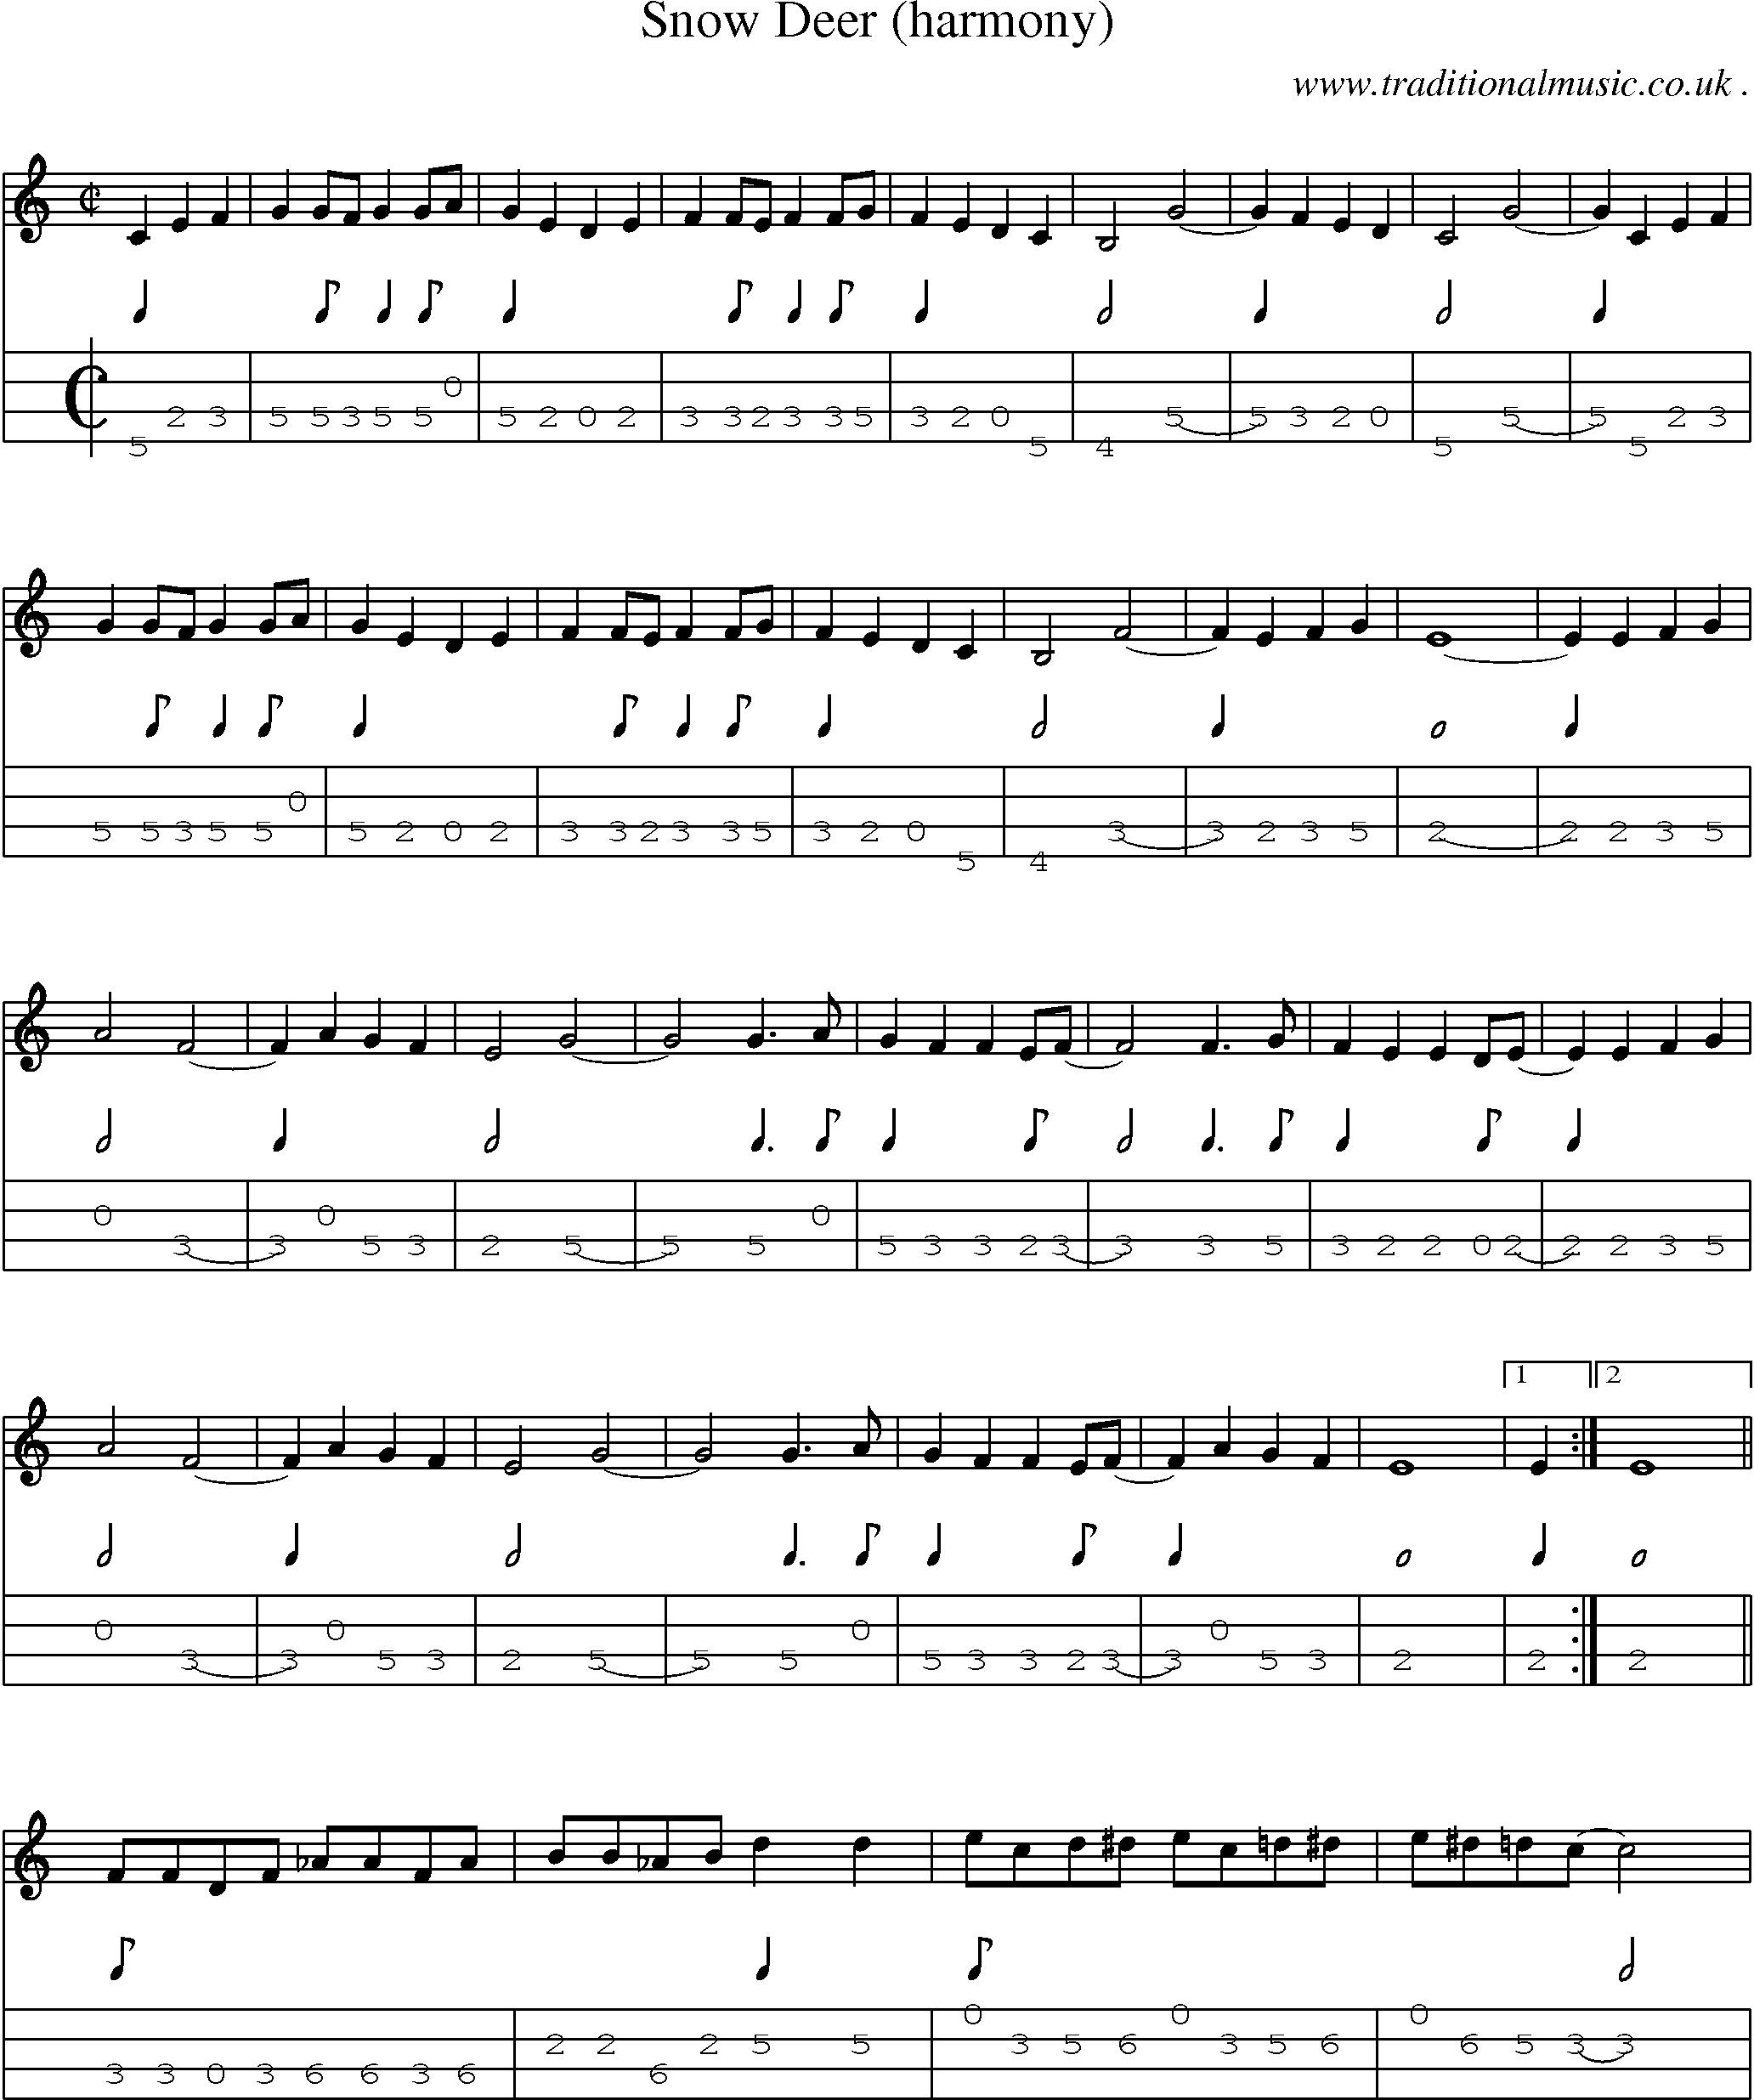 Music score and mandolin tabs for snow deer harmony sheet music score and mandolin tabs for snow deer harmony hexwebz Images